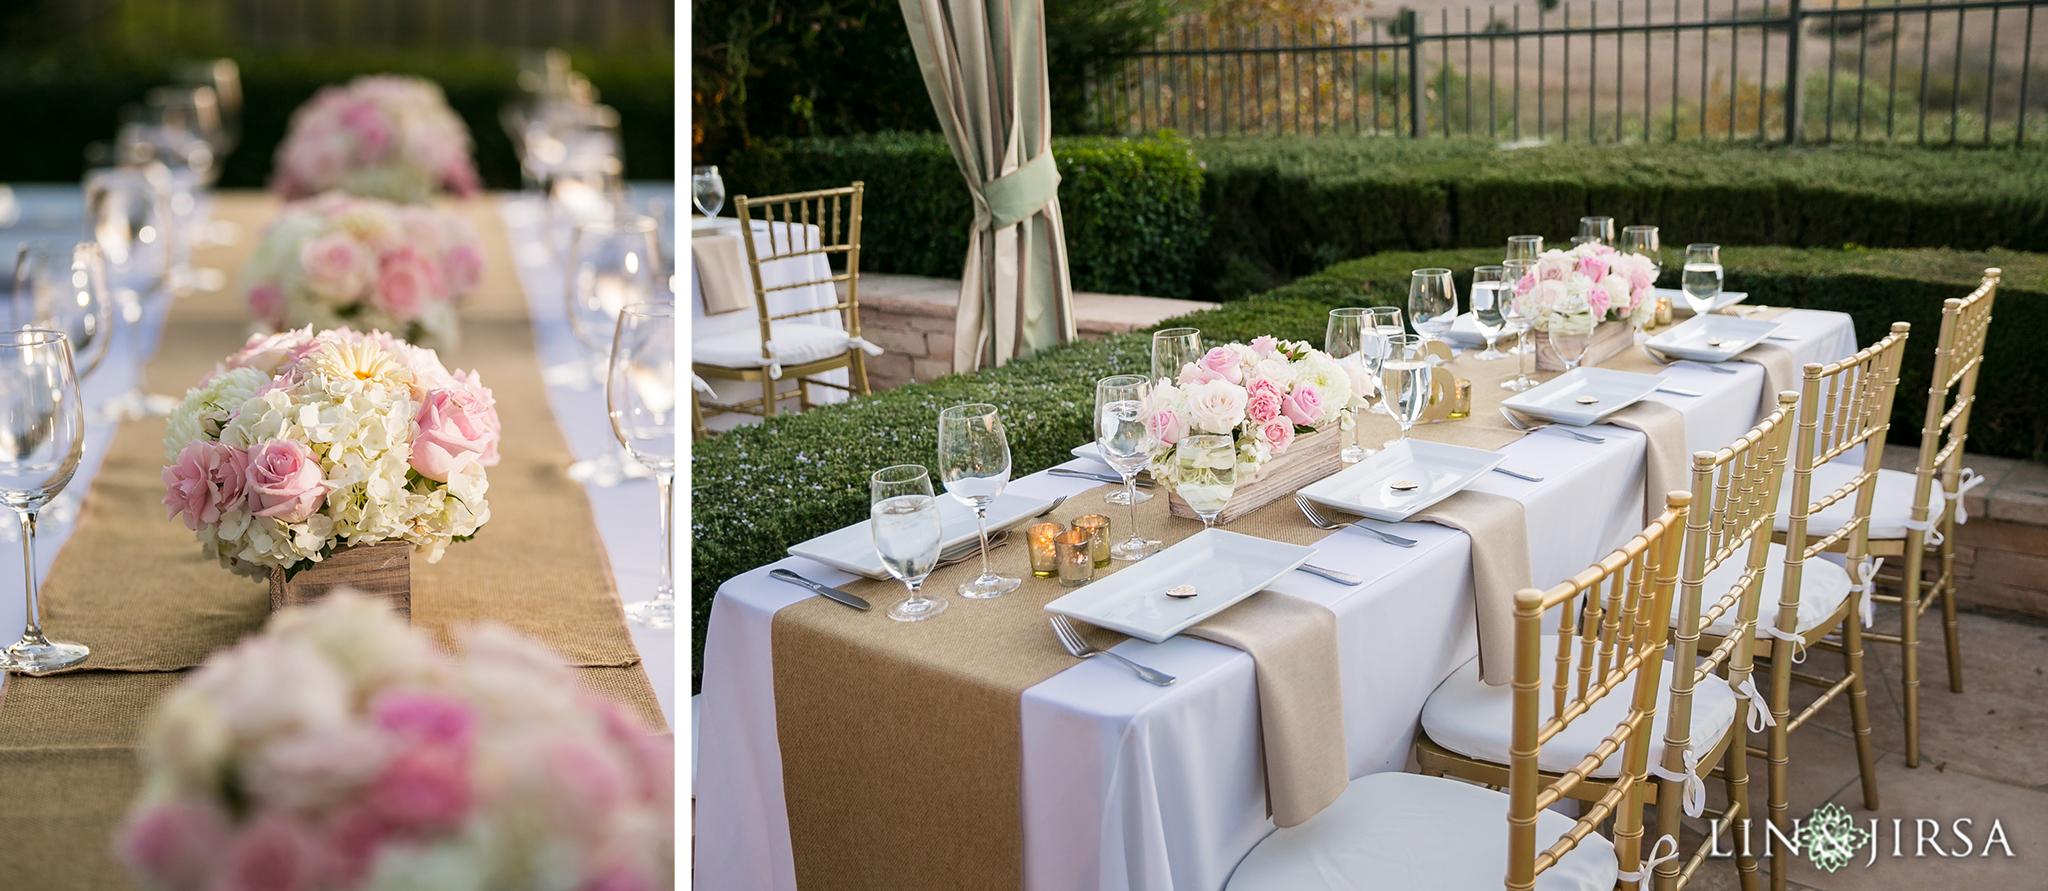 19-monarch-beach-resort-wedding-photography